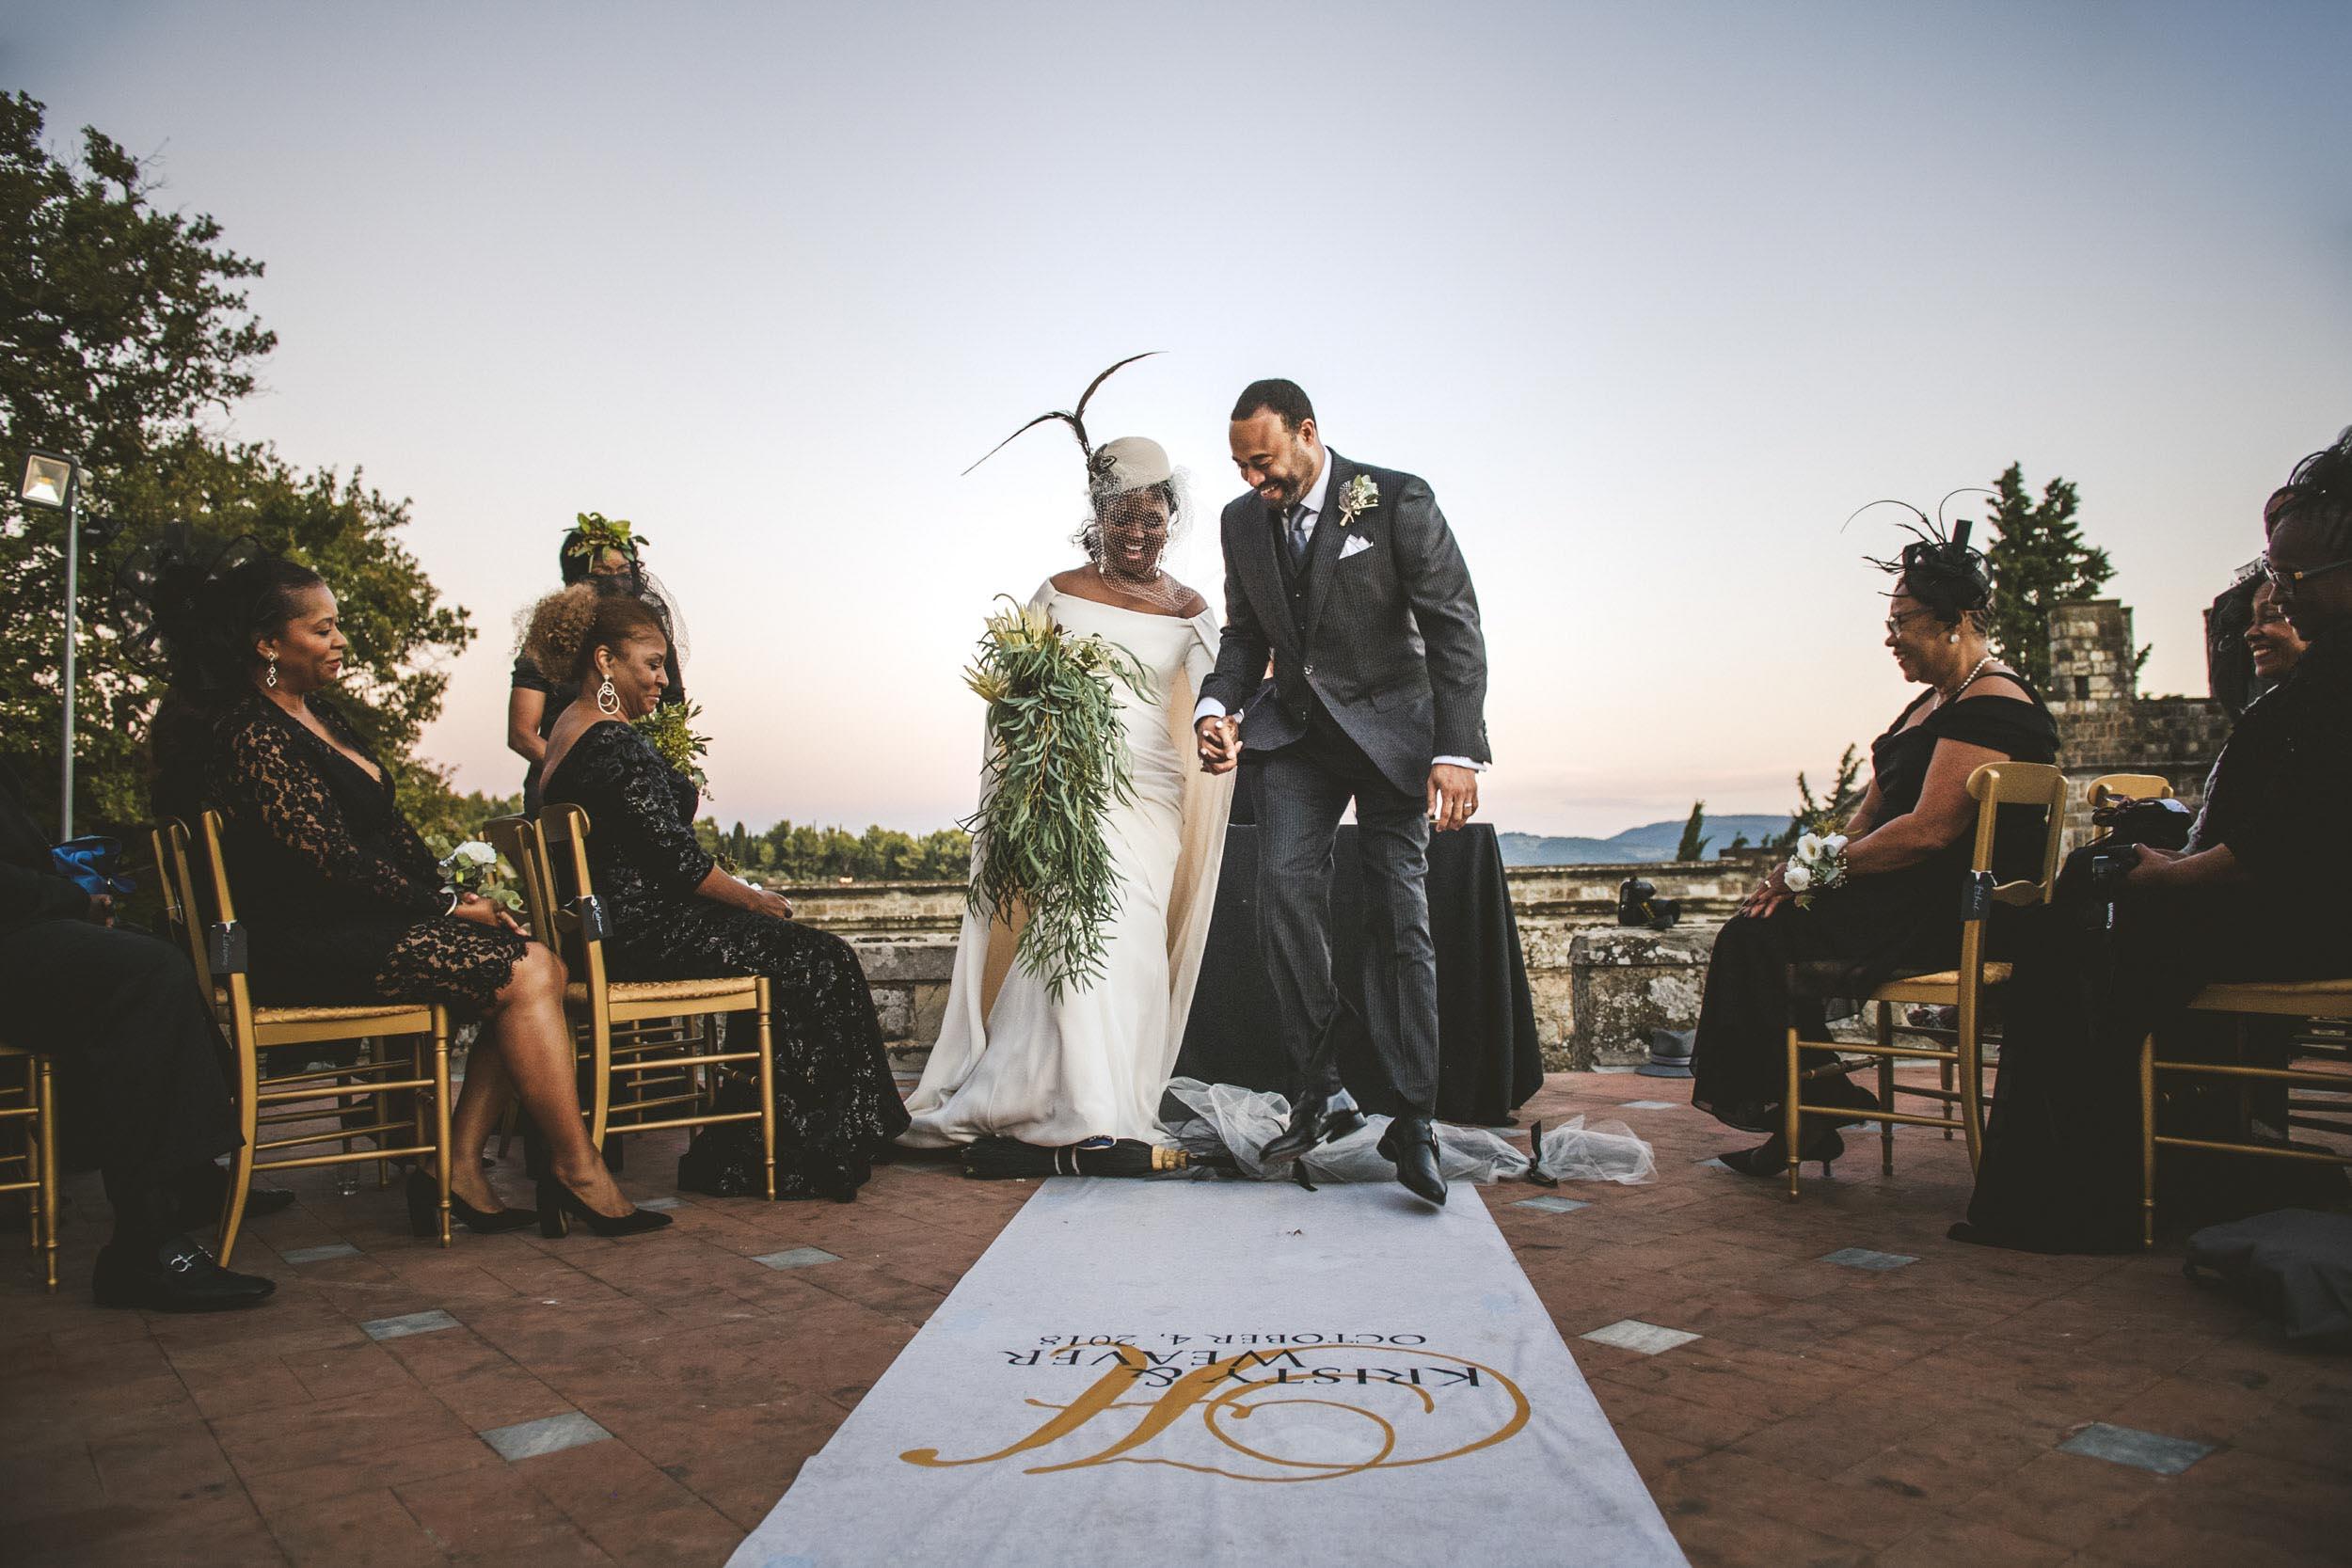 DESTINATION WEDDING IN TUSCANY   ♥ Kristy + Weaver ♥